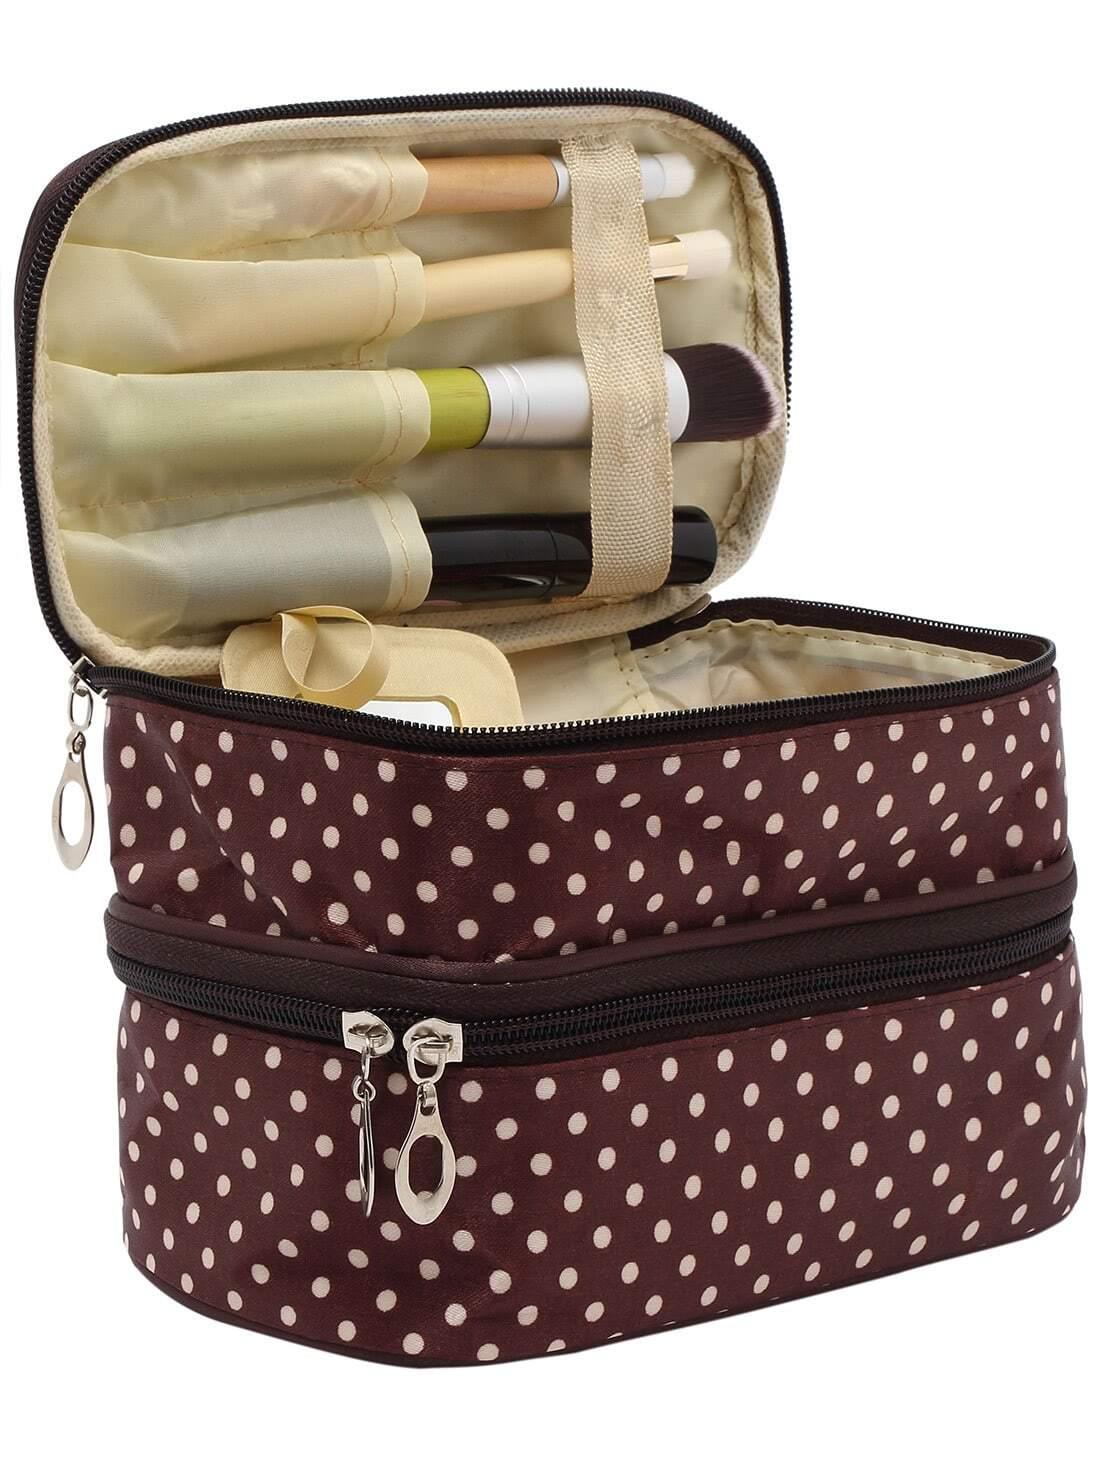 Coffee Polka Dot Double Layers Cosmetic Bag transer jasmine polka dot flip double zipper cosmetic bag 0213 drop shipping